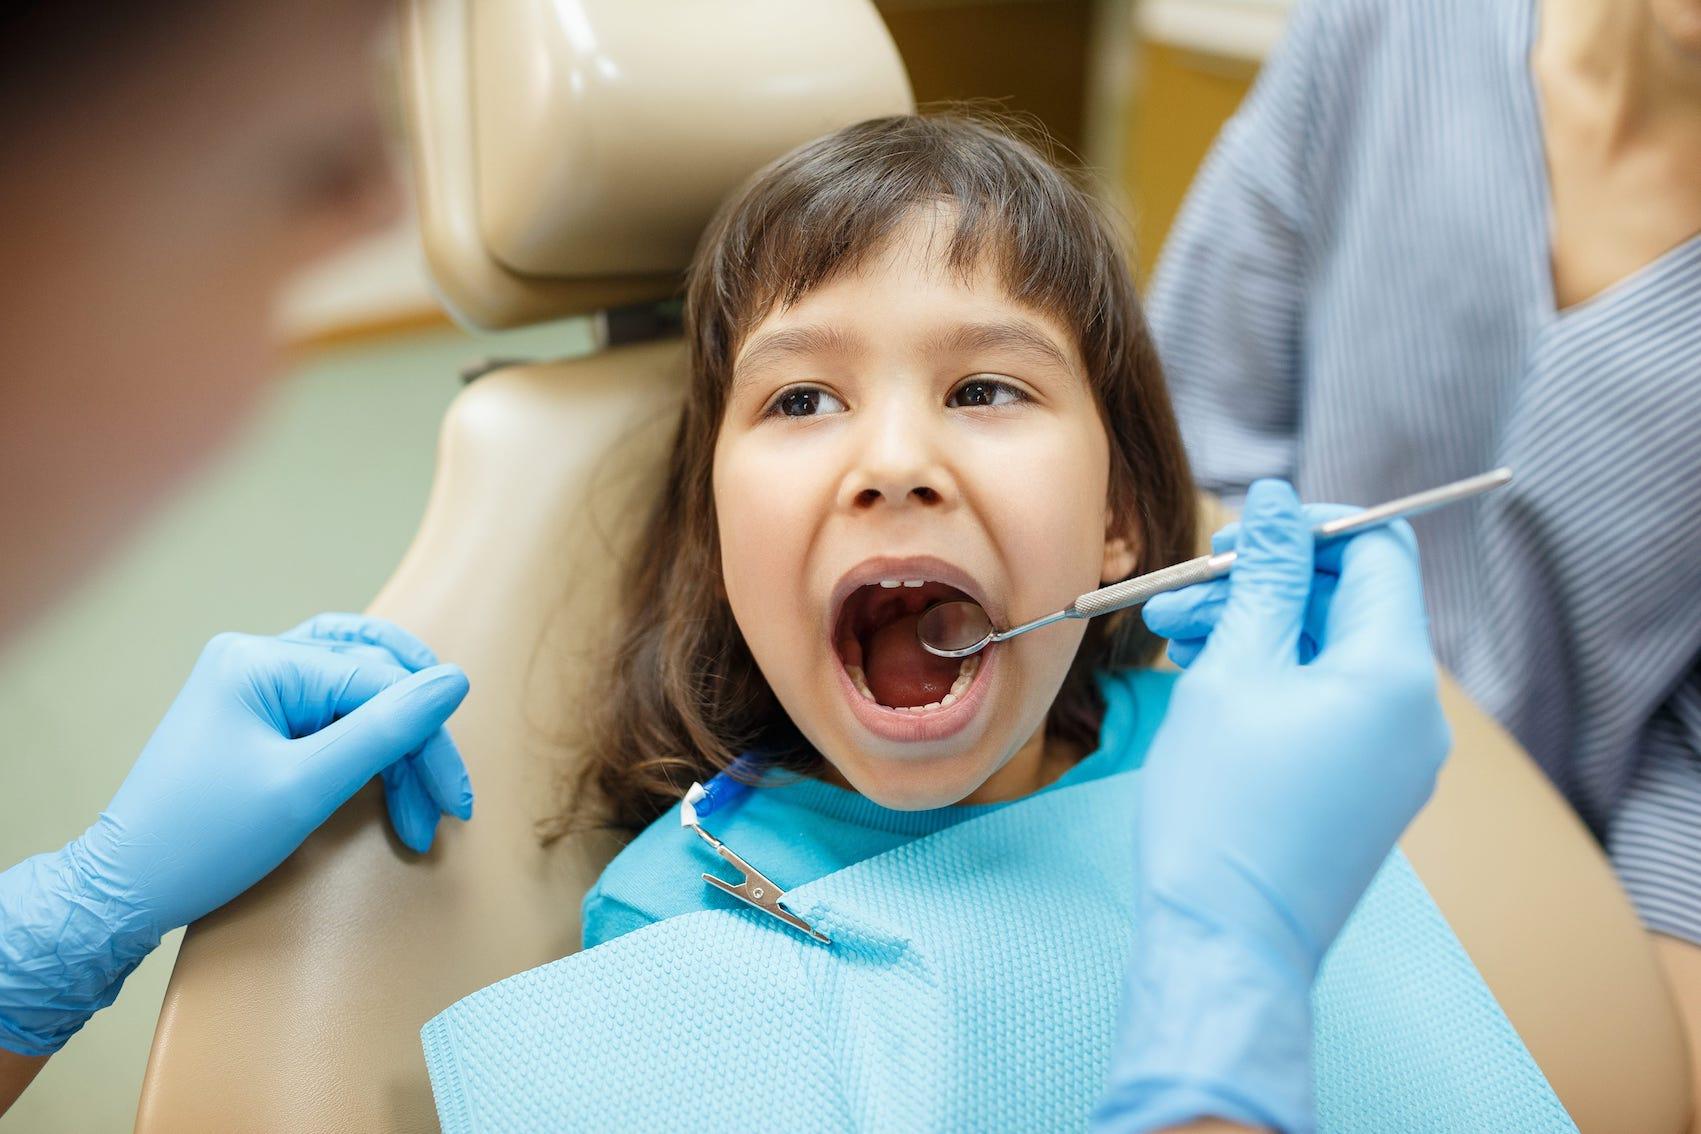 Dentist_check_up_girl.jpeg